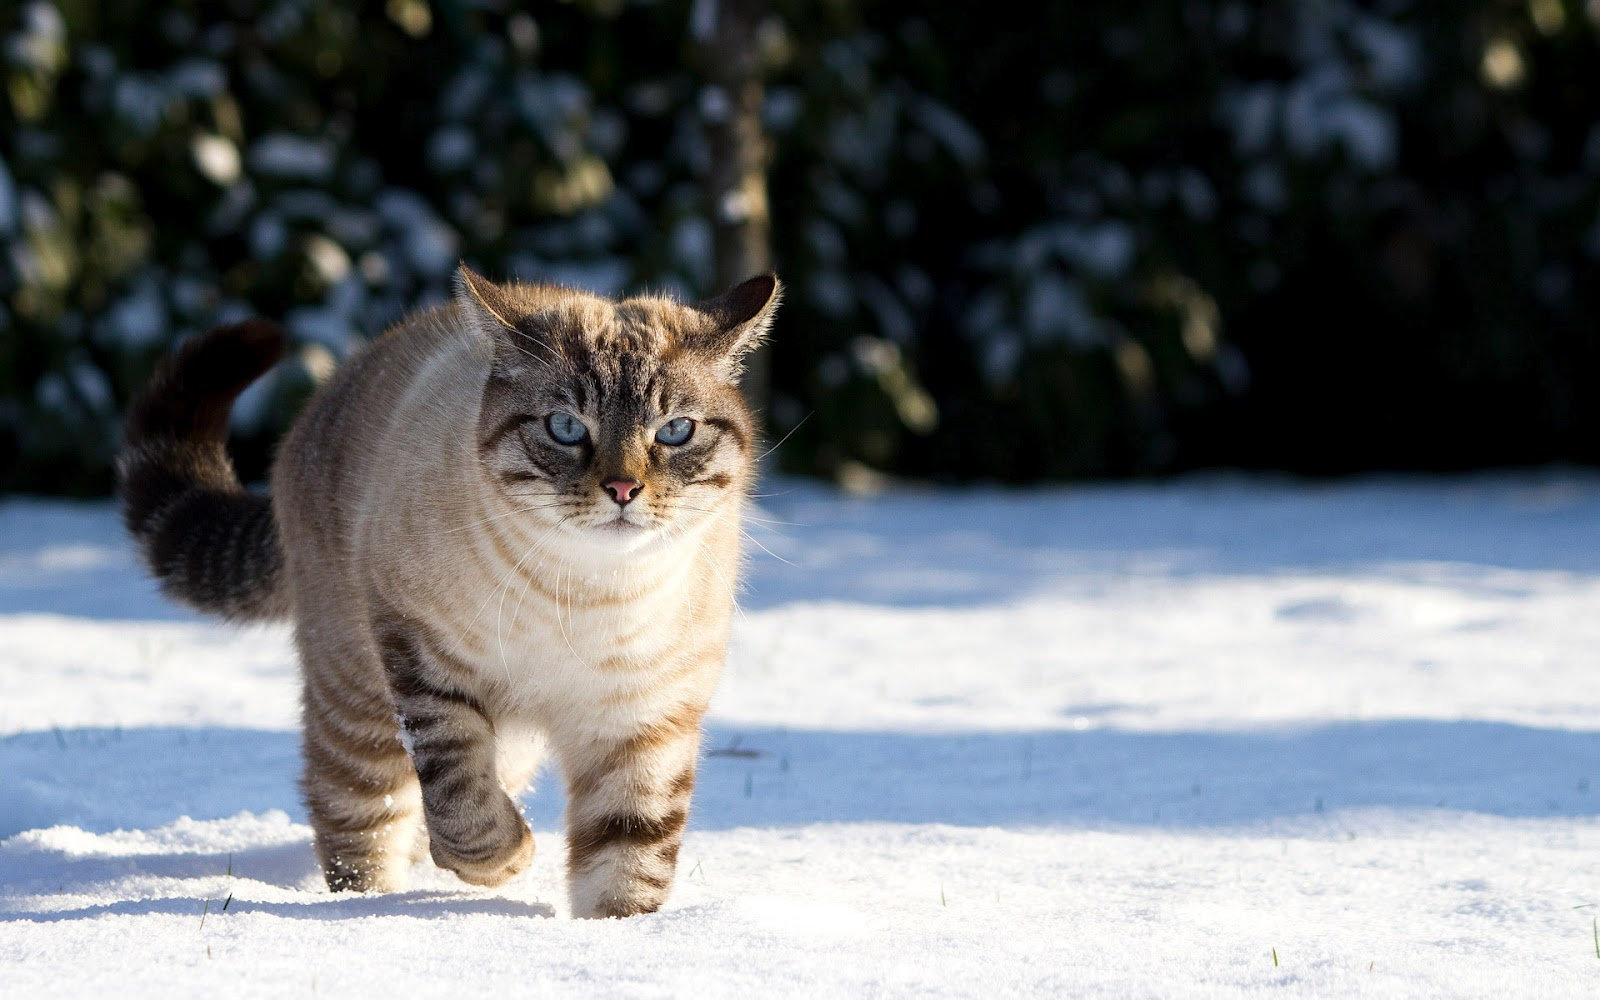 http://2.bp.blogspot.com/-NS82W4HPRgo/UA63WXYo6-I/AAAAAAAADZs/TovfjlYVCDQ/s1600/hd-kat-achtergrond-een-kat-in-de-sneeuw-kat-wallpaper.jpg